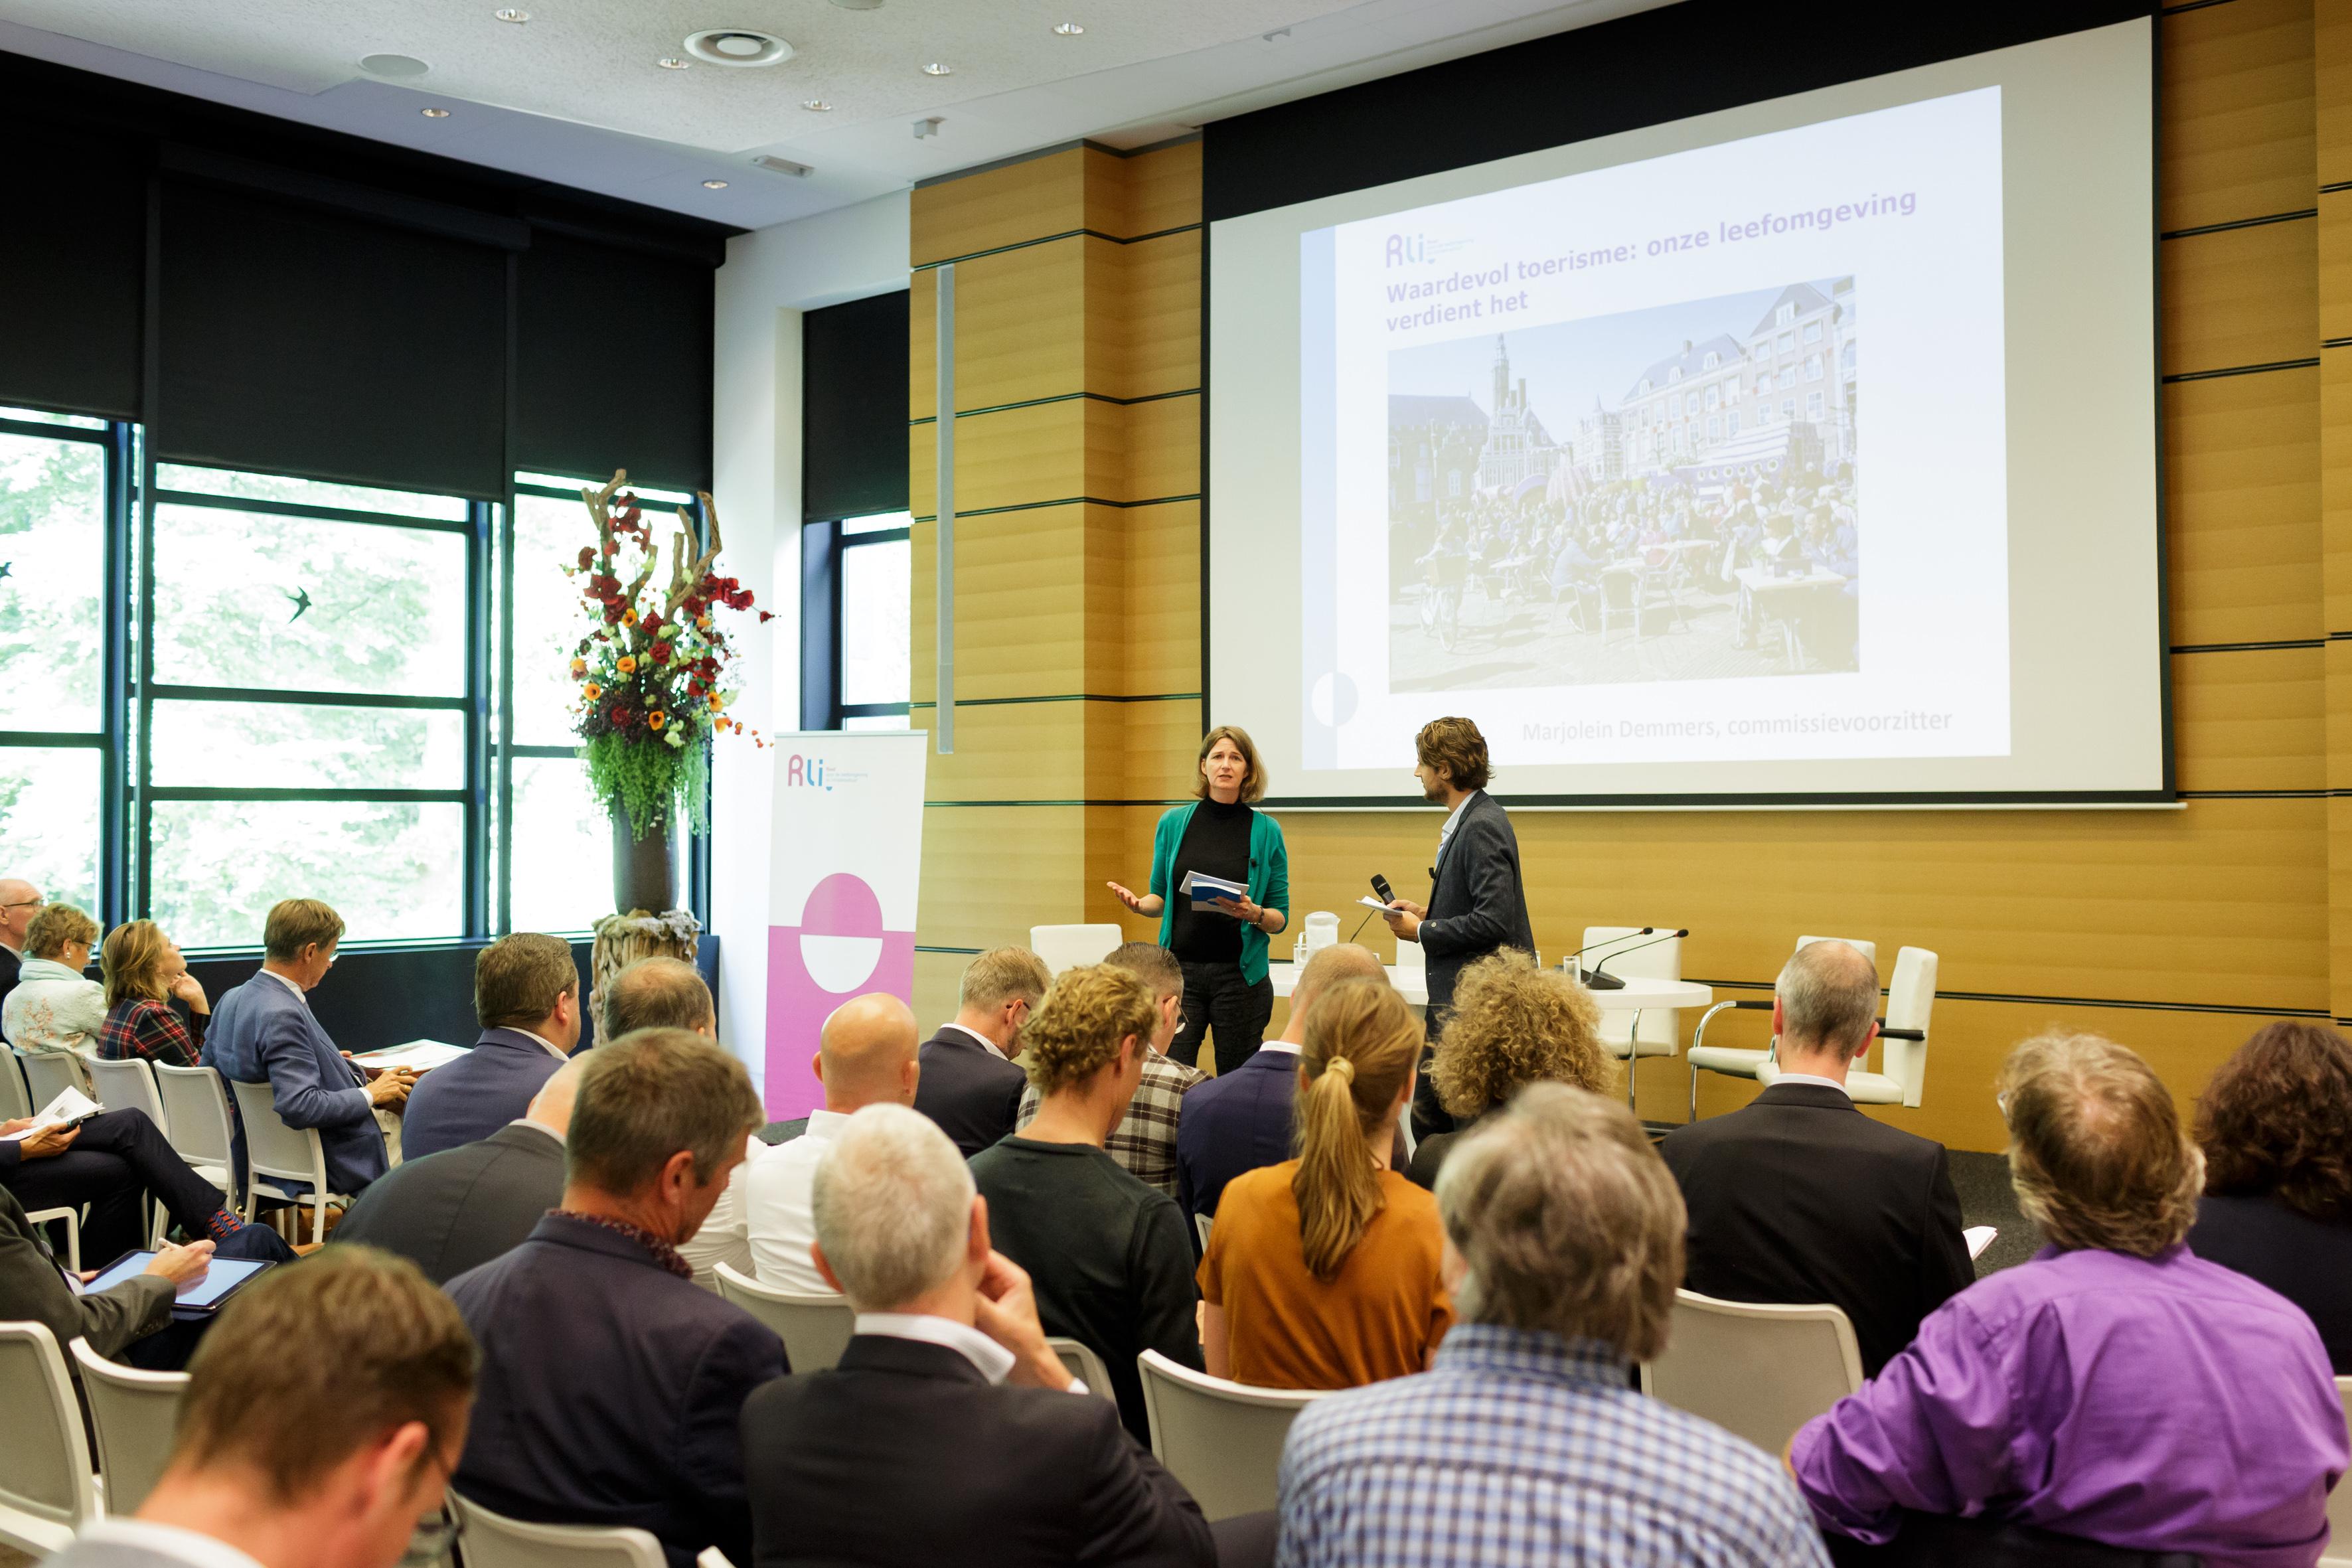 Marjolein Demmers, raadslid Rli,  licht het advies 'Waardevol toerisme' toe. Foto Fred Ernst